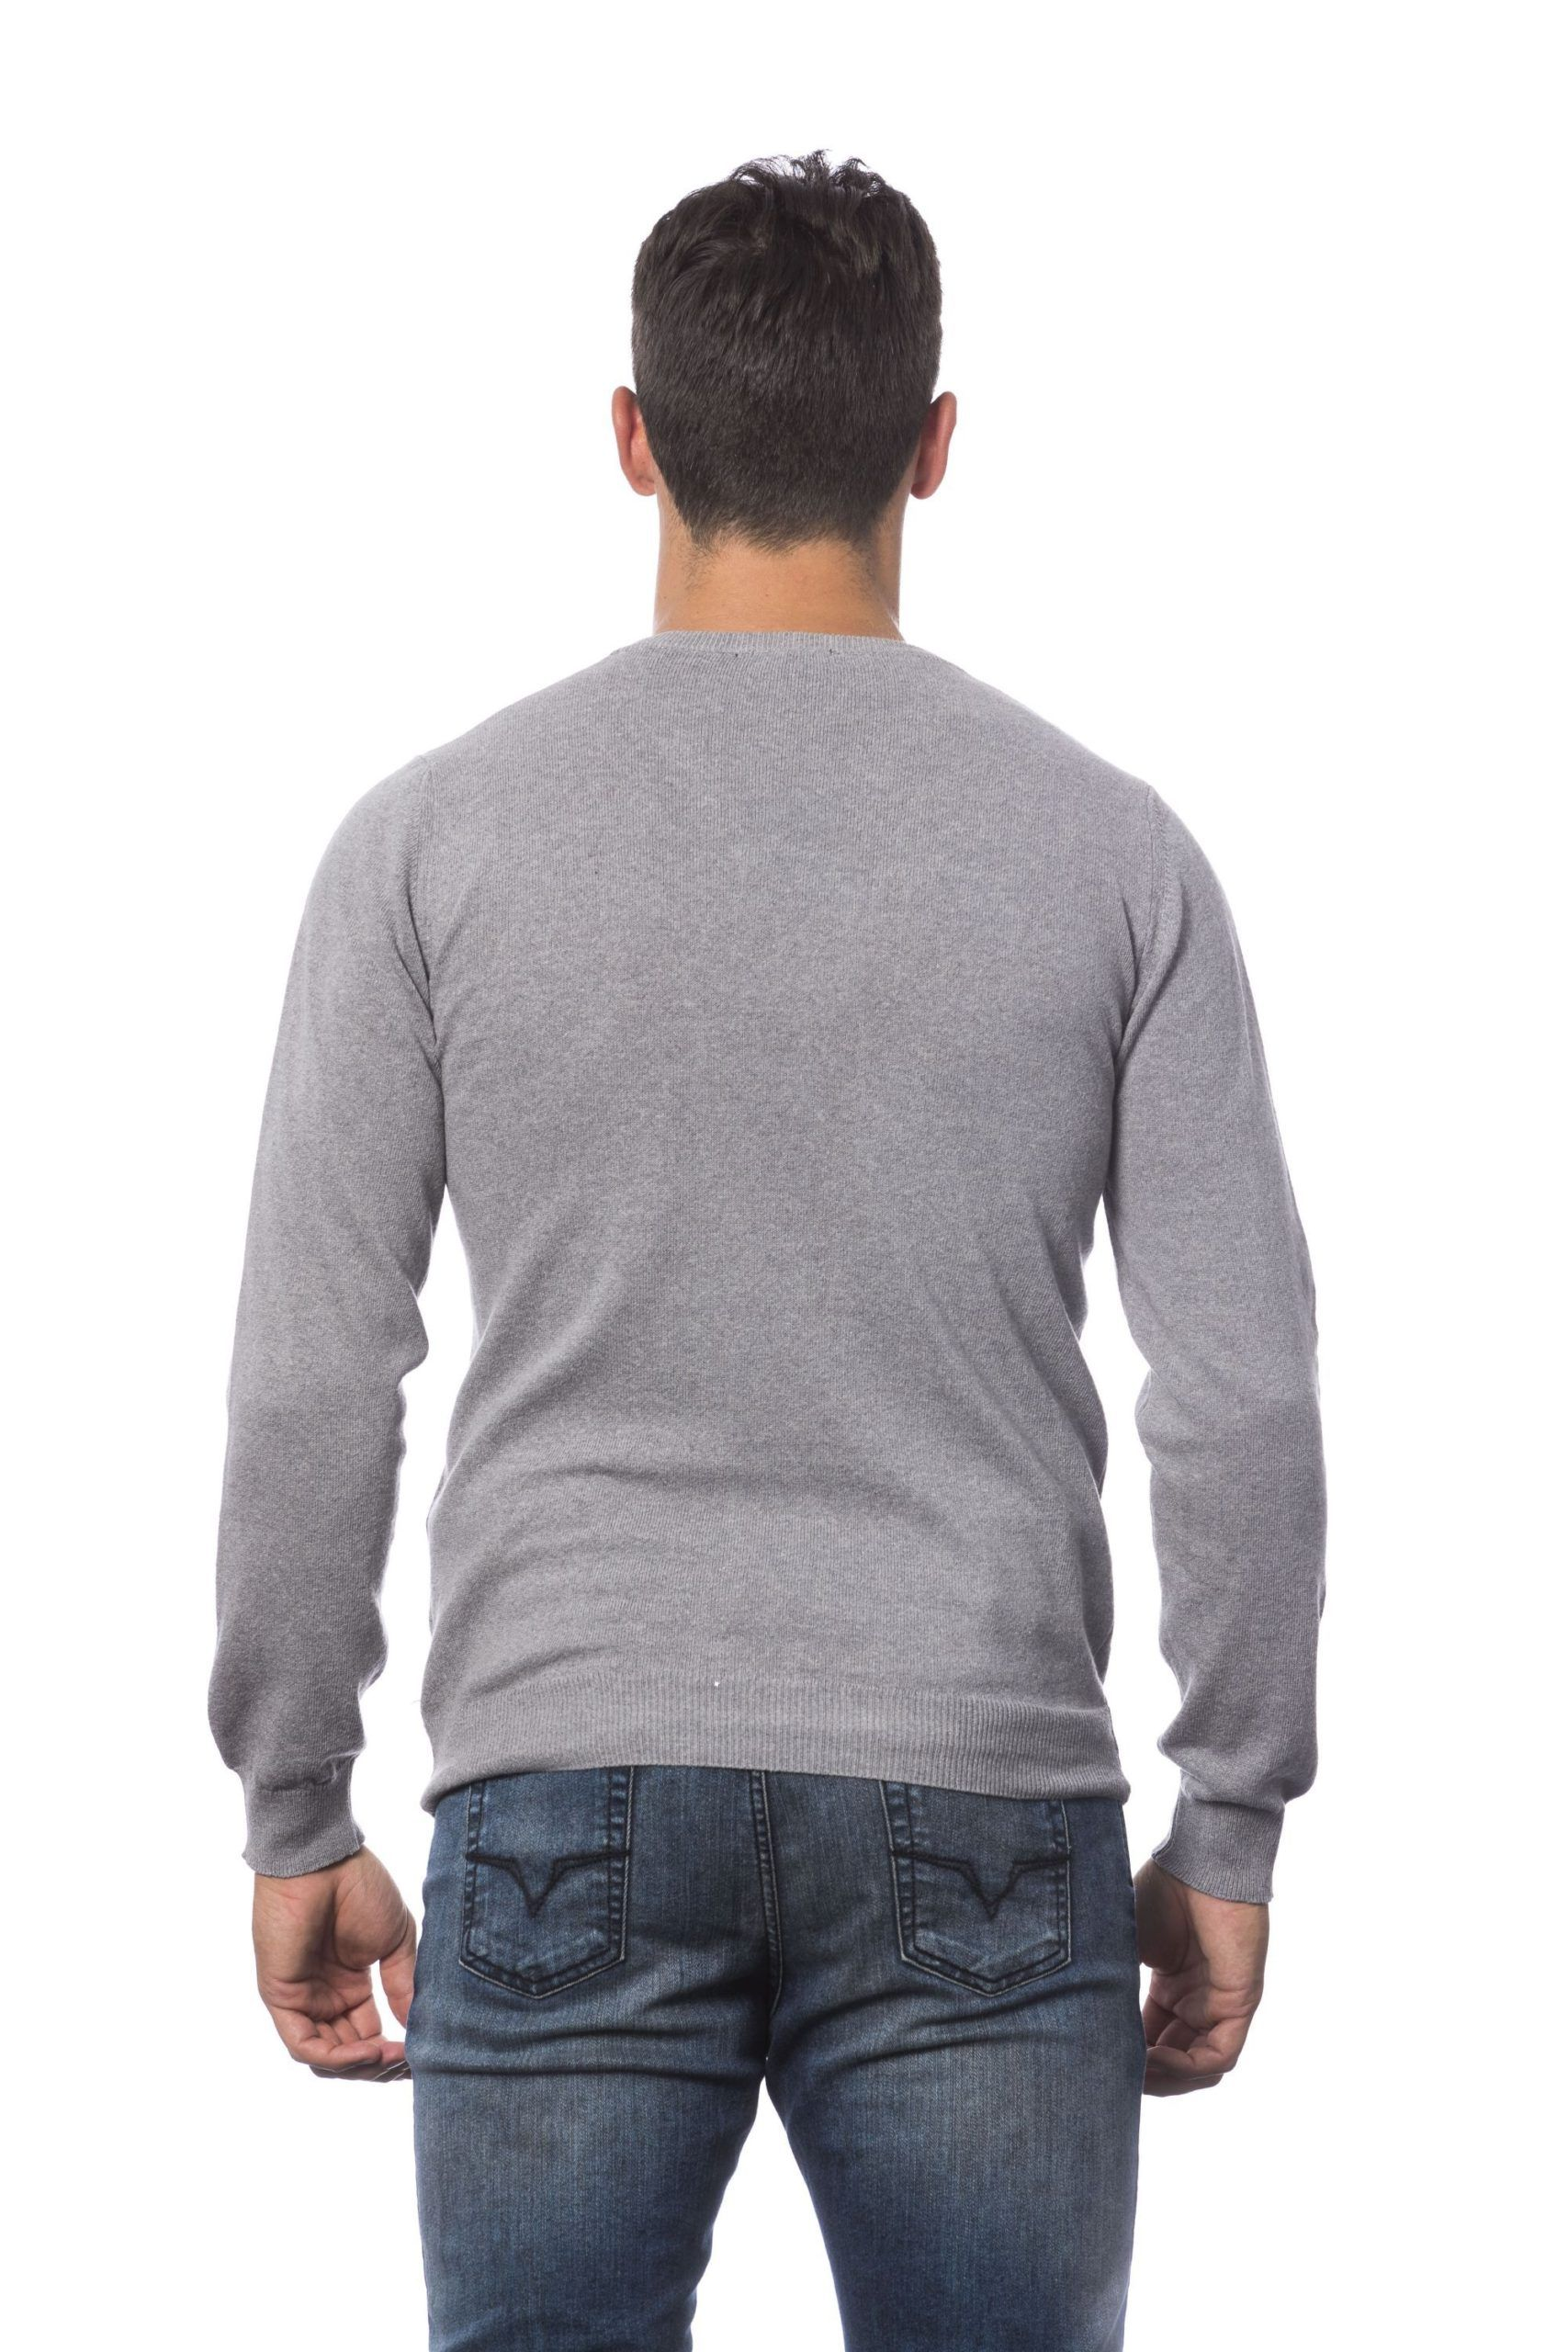 Roberto Cavalli Sport Grigiomedio Sweater